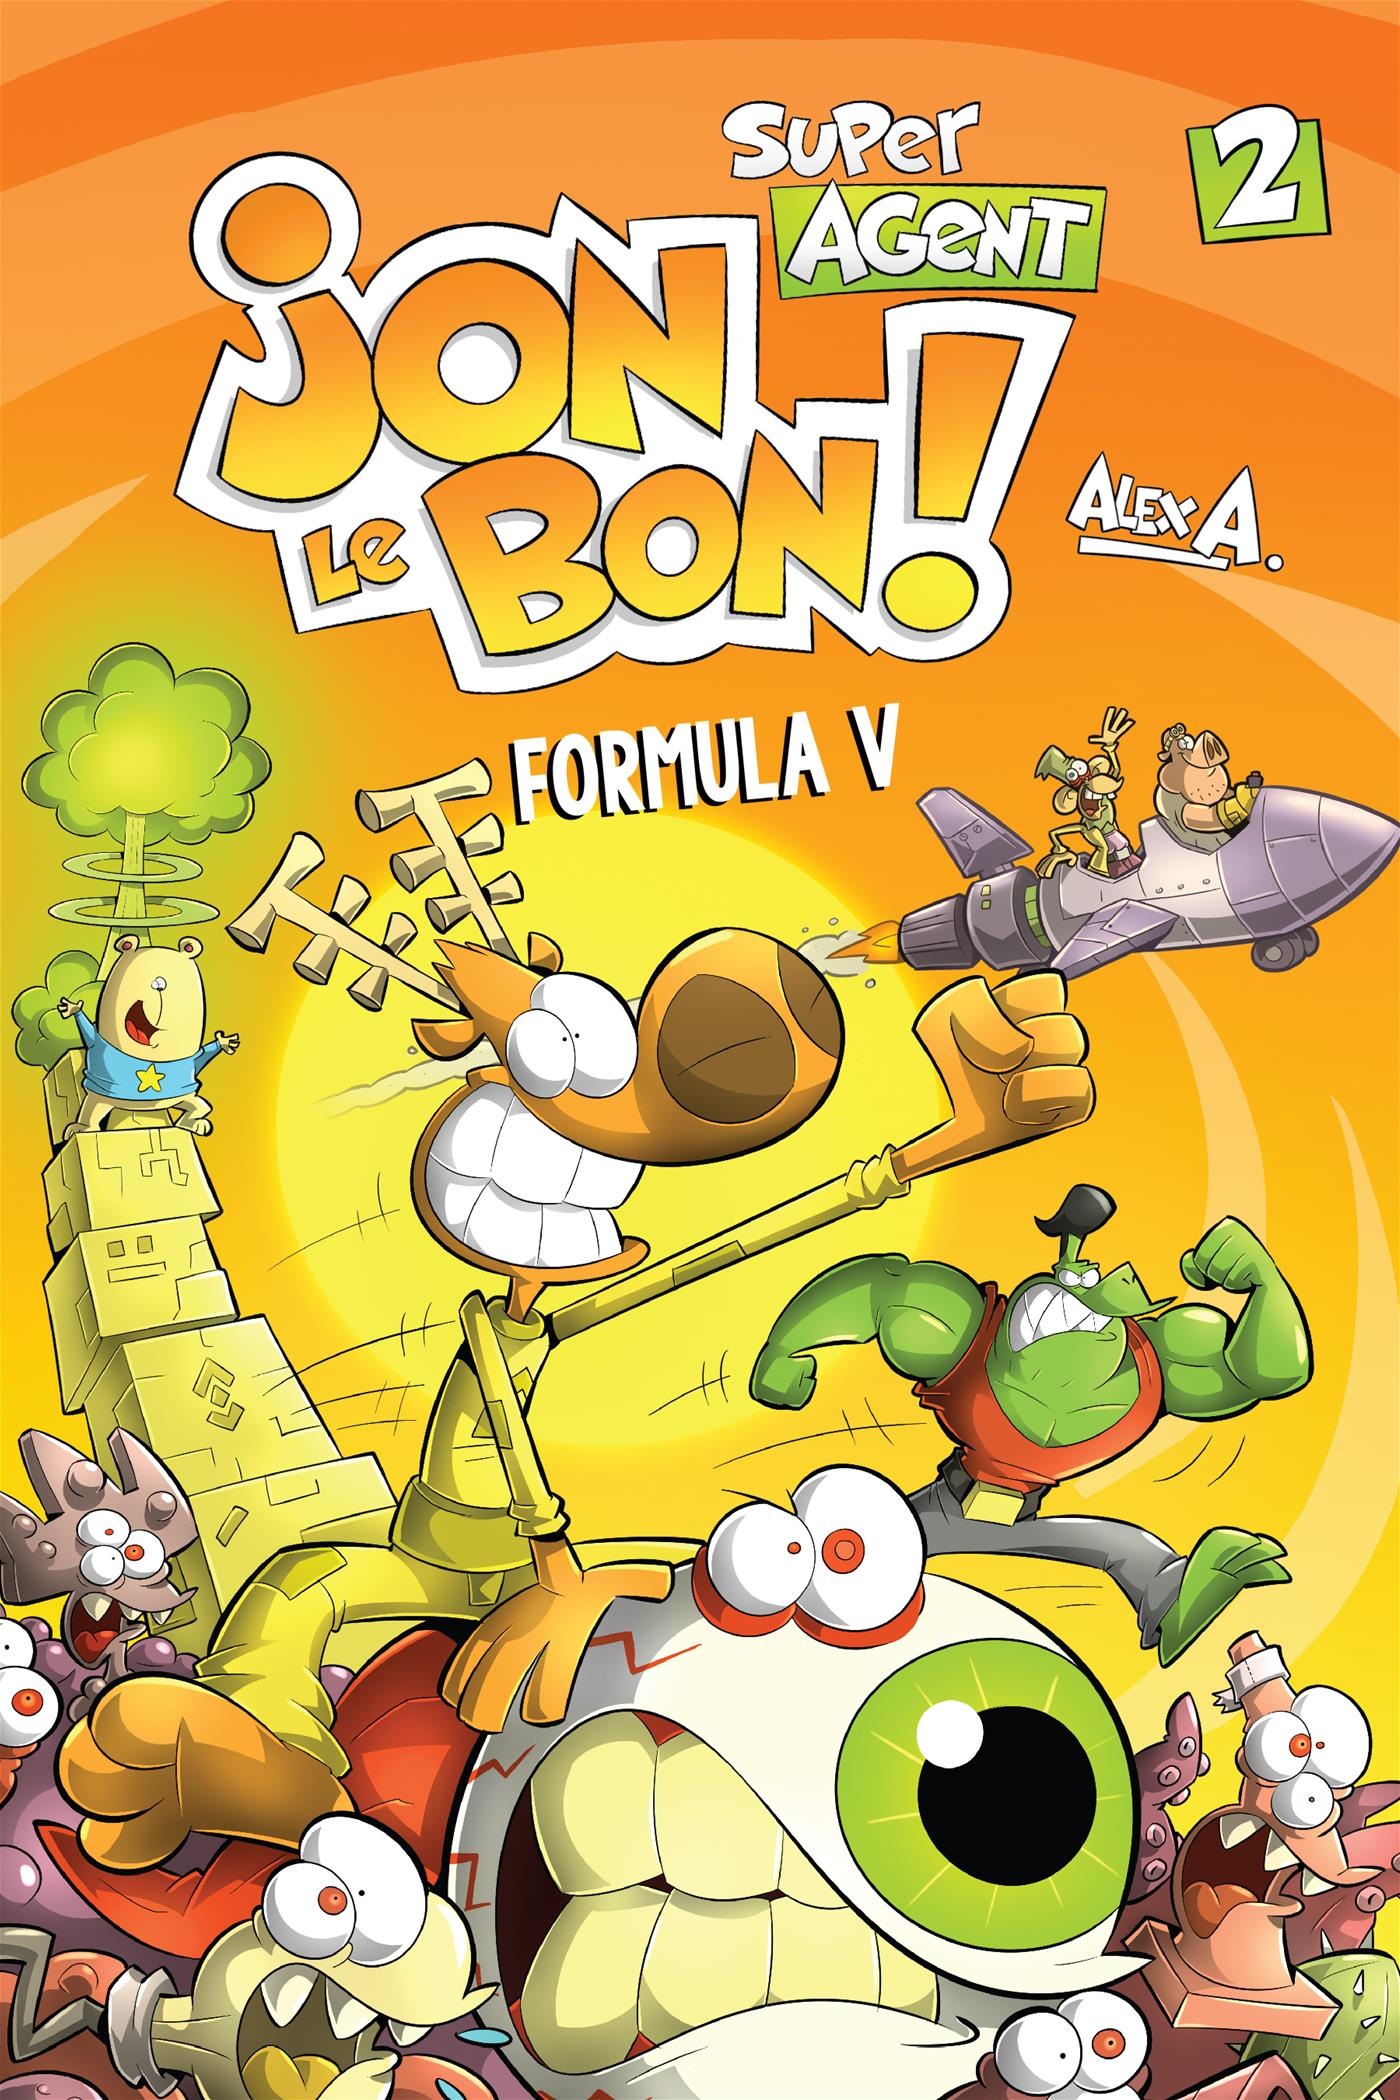 Jon Le Bon Vol 2. Formula V